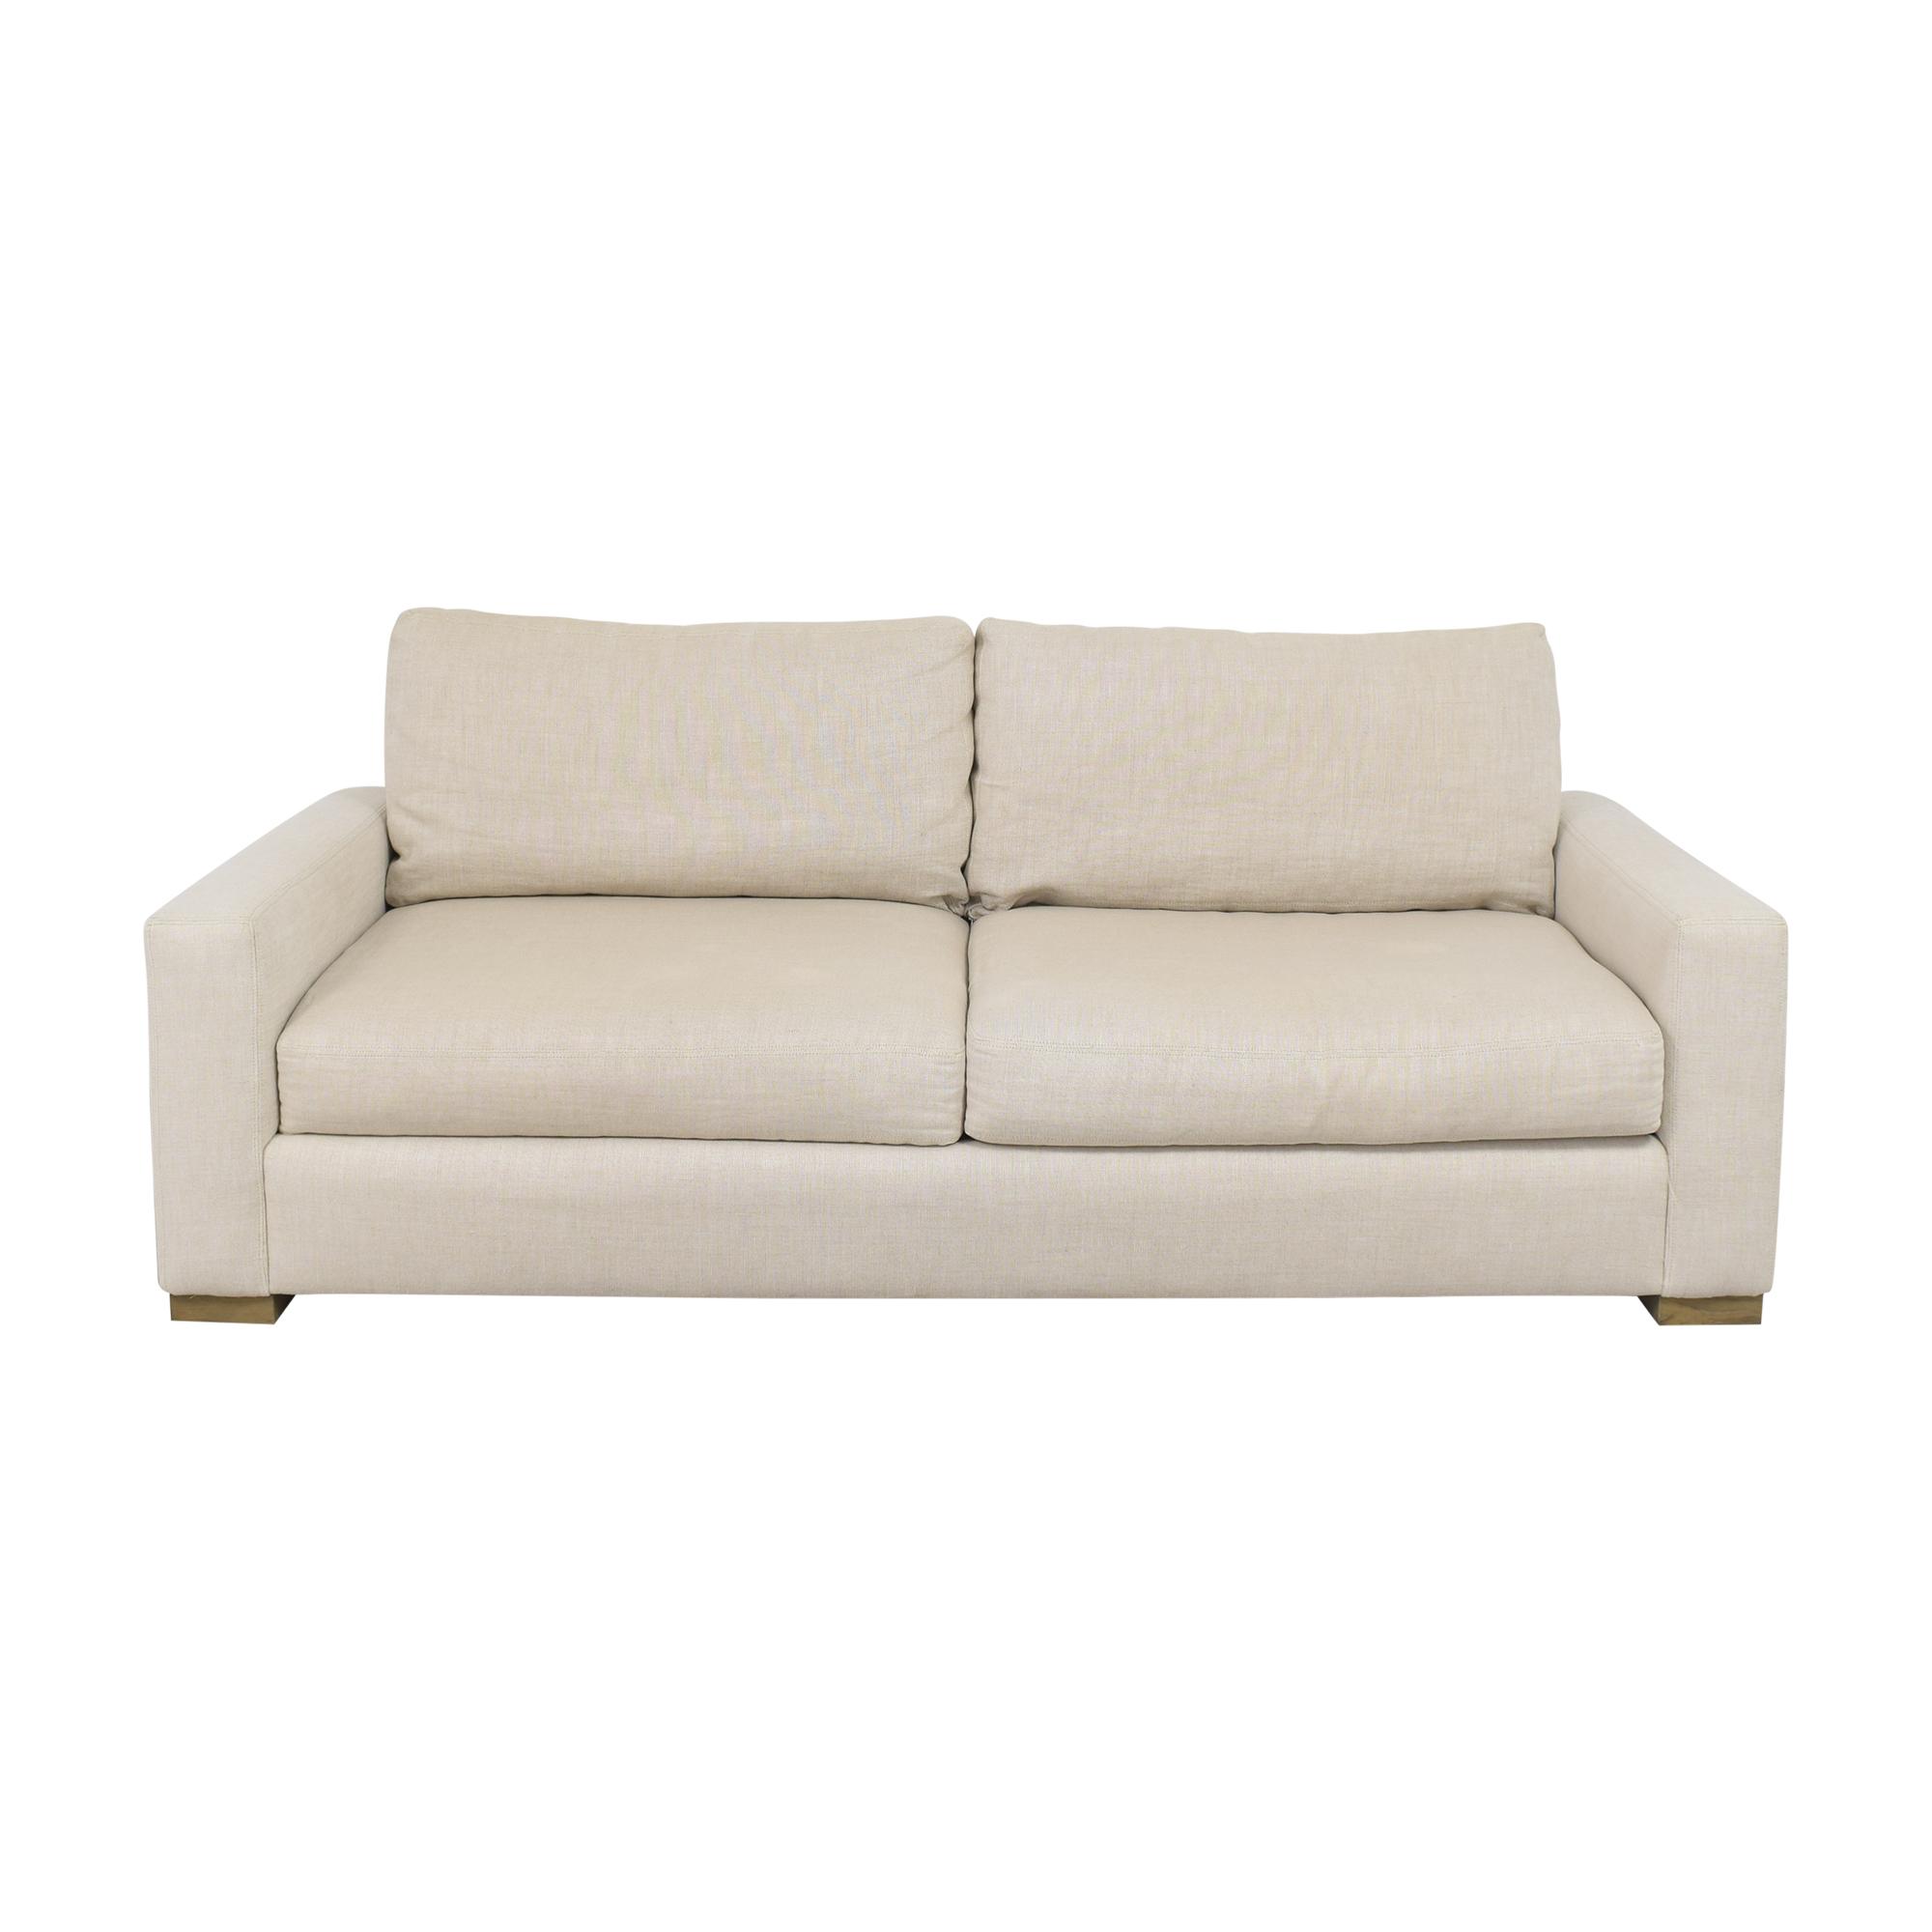 Restoration Hardware Restoration Hardware Two Cushion Sofa price